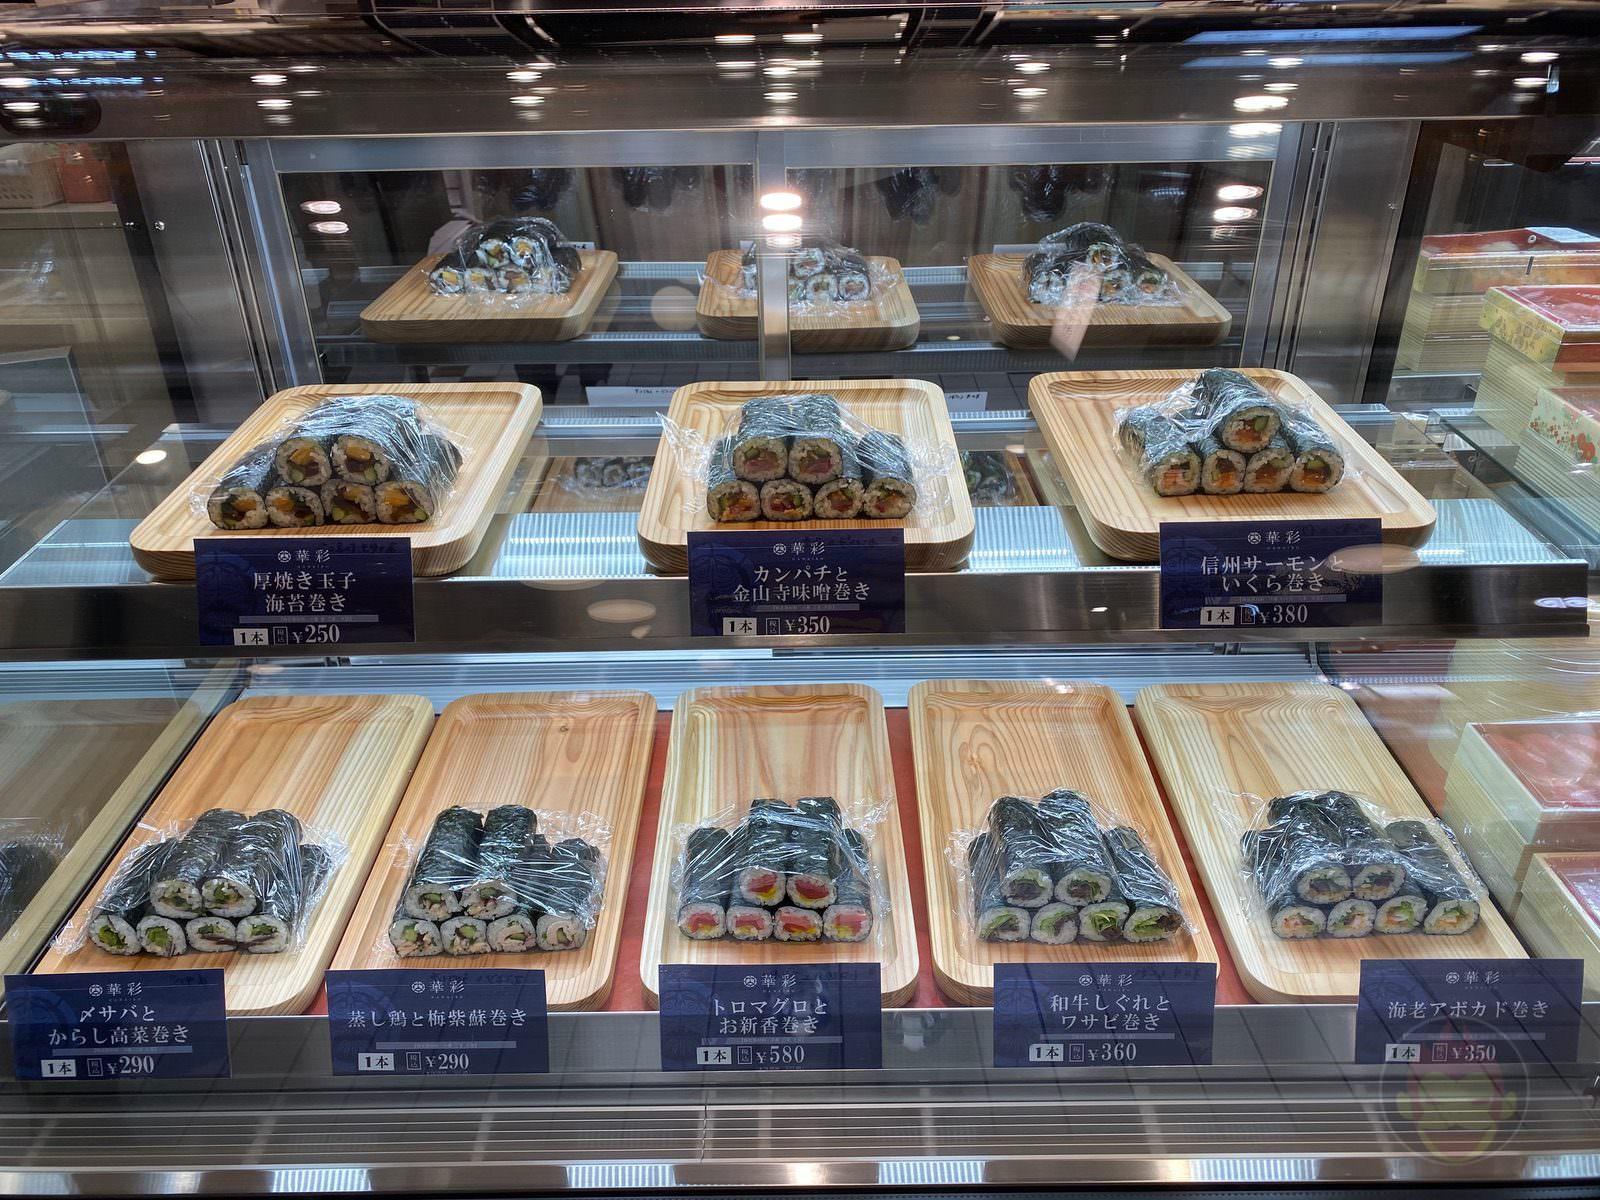 Shibuya-Scramble-Square-Food-I-Ate-123.jpeg